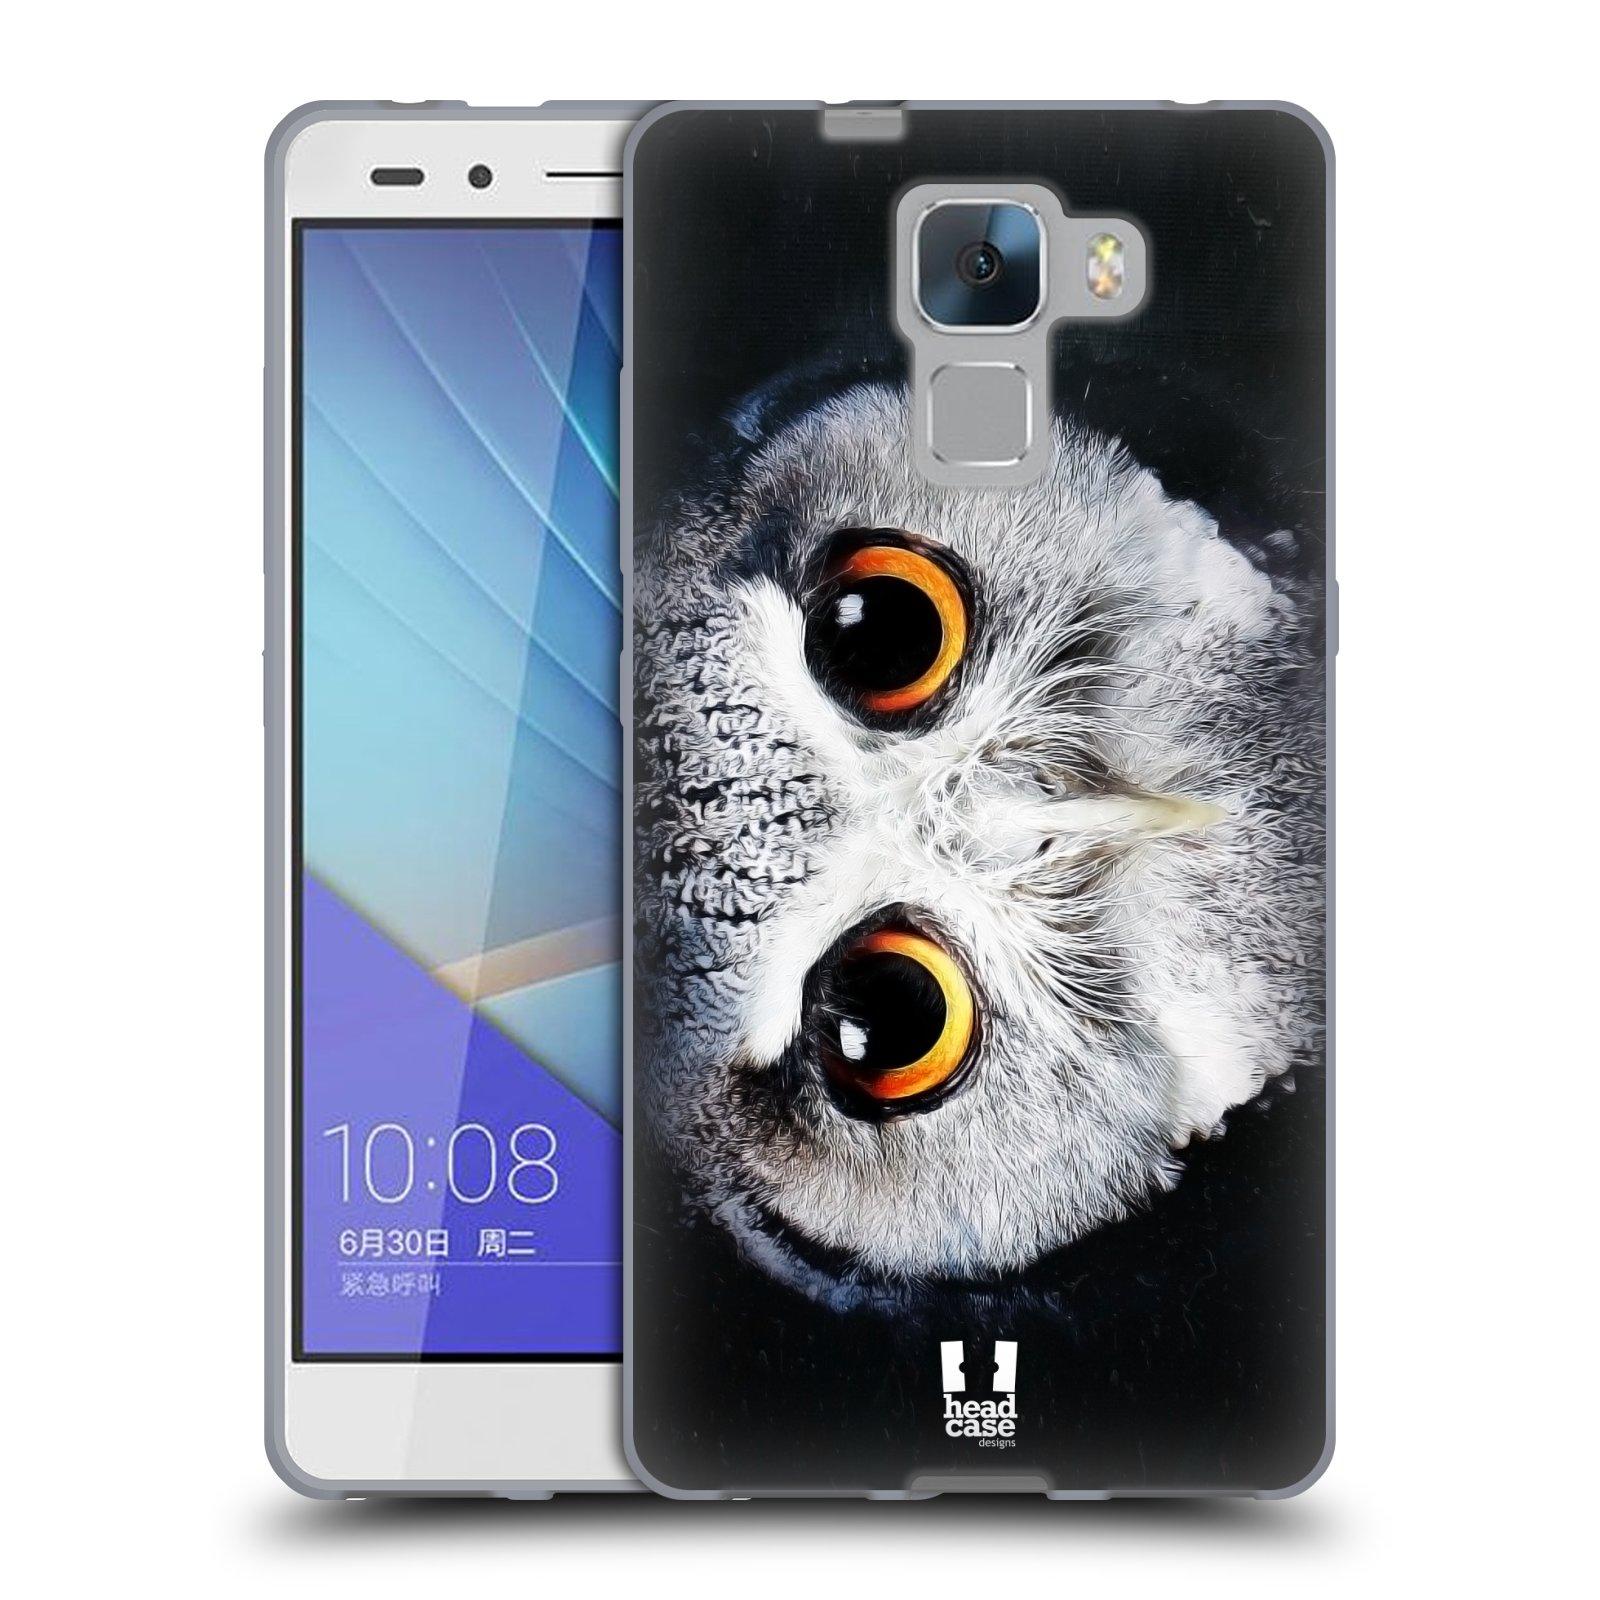 HEAD CASE silikonový obal na mobil HUAWEI HONOR 7 vzor Zvířecí tváře sova